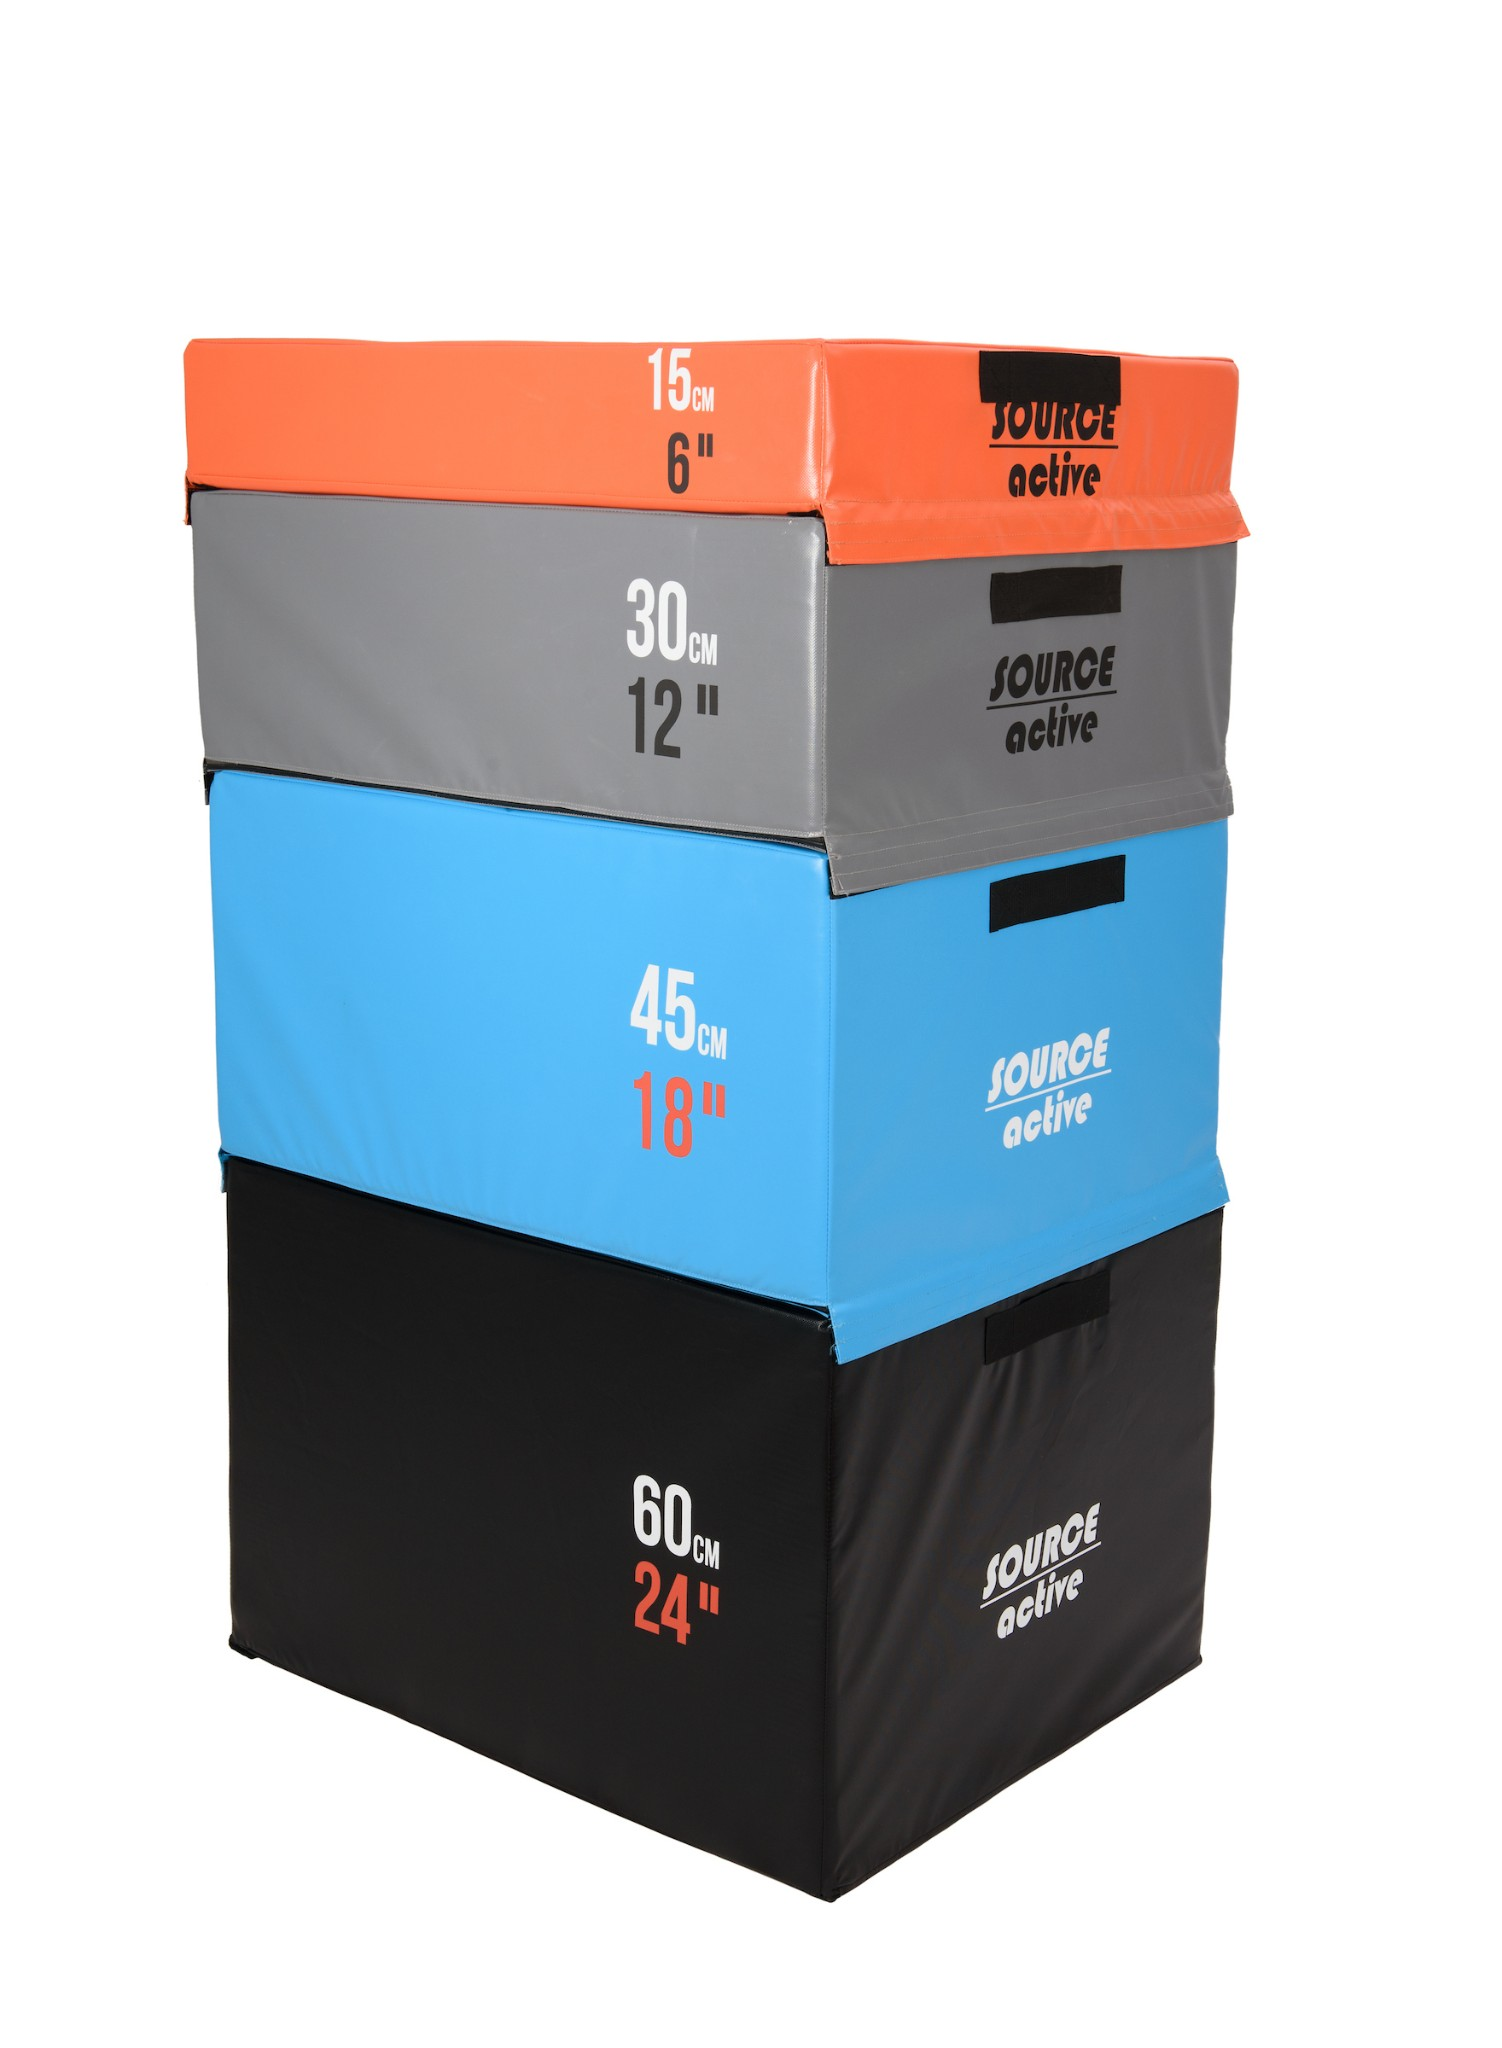 SOURCE ACTIVE SOFT PLYOMETRIC JUMP BOXES